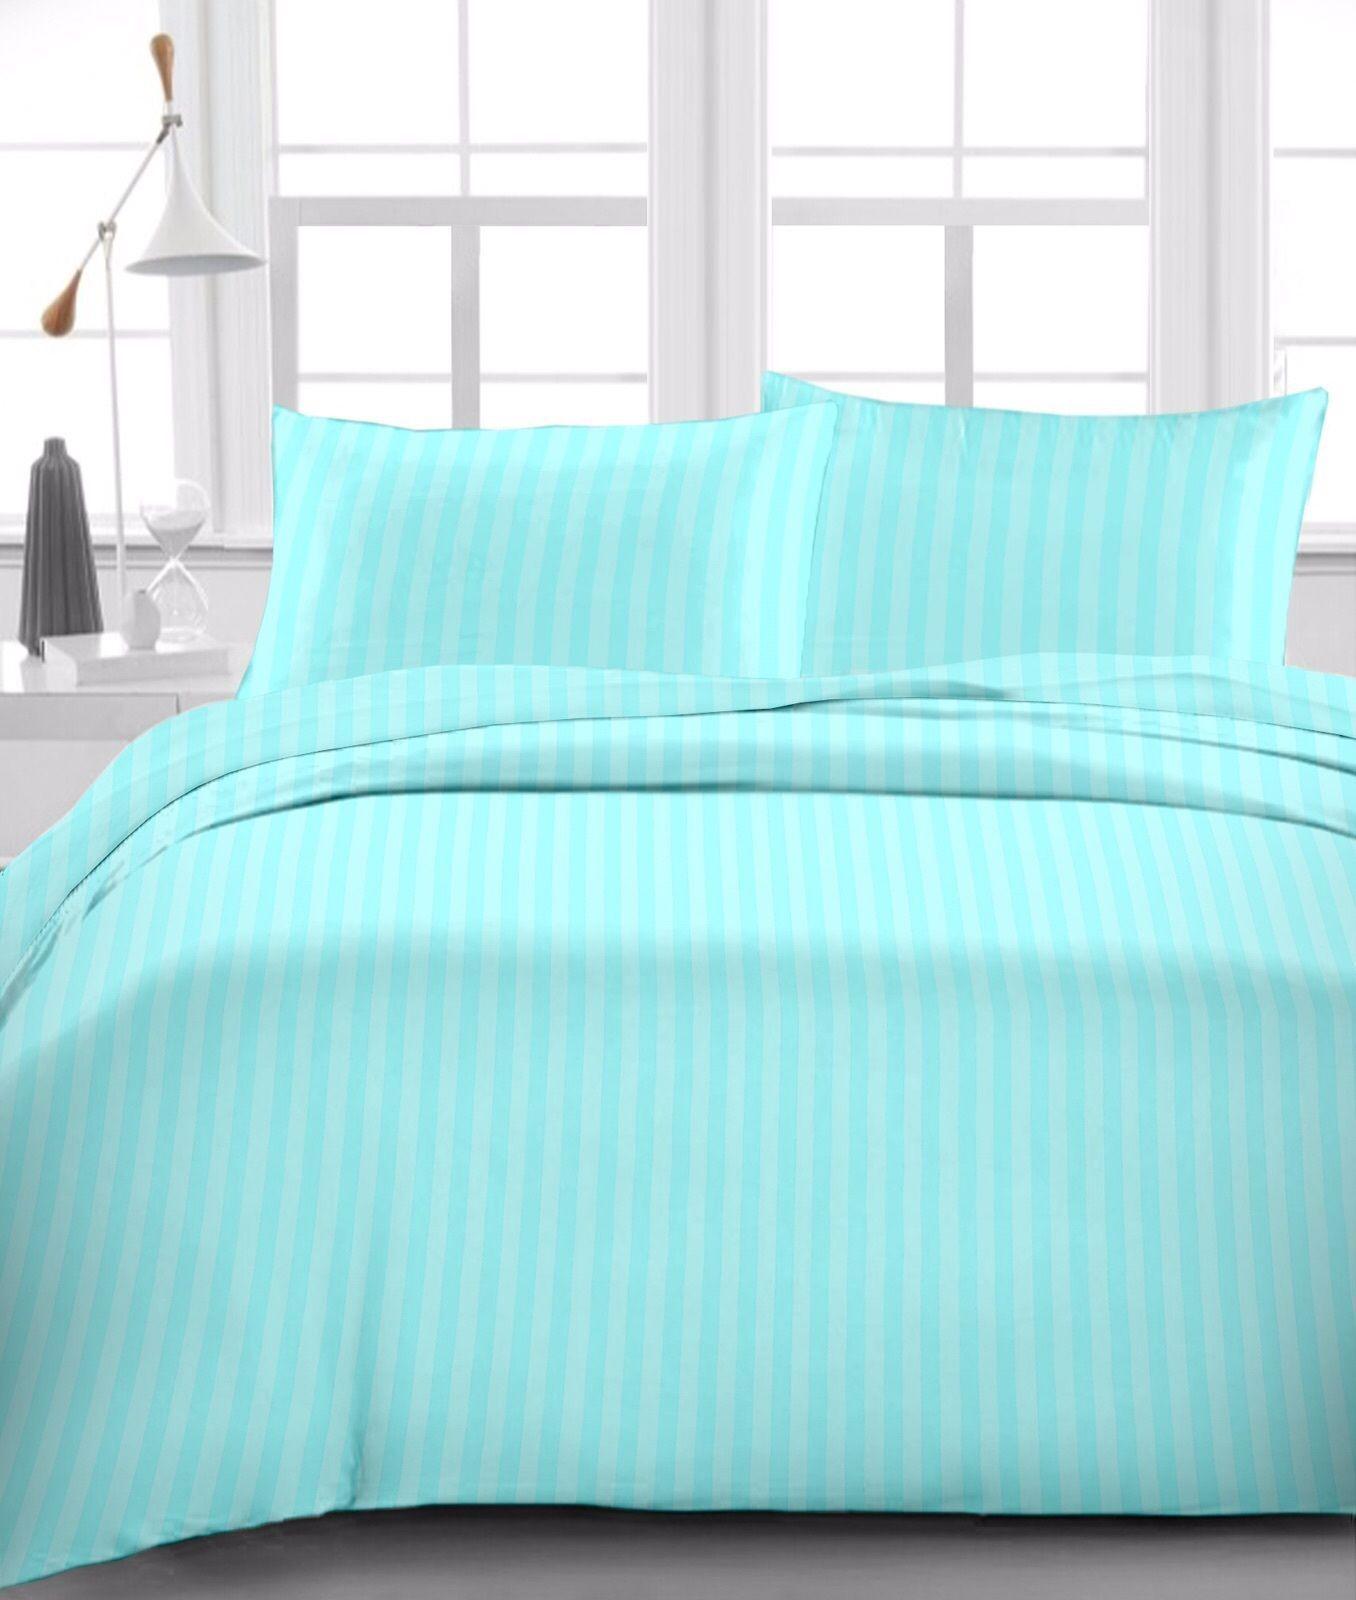 4pcs water bed sheet set egyptian cotton 1000 tc drop 8 30 inch aqua